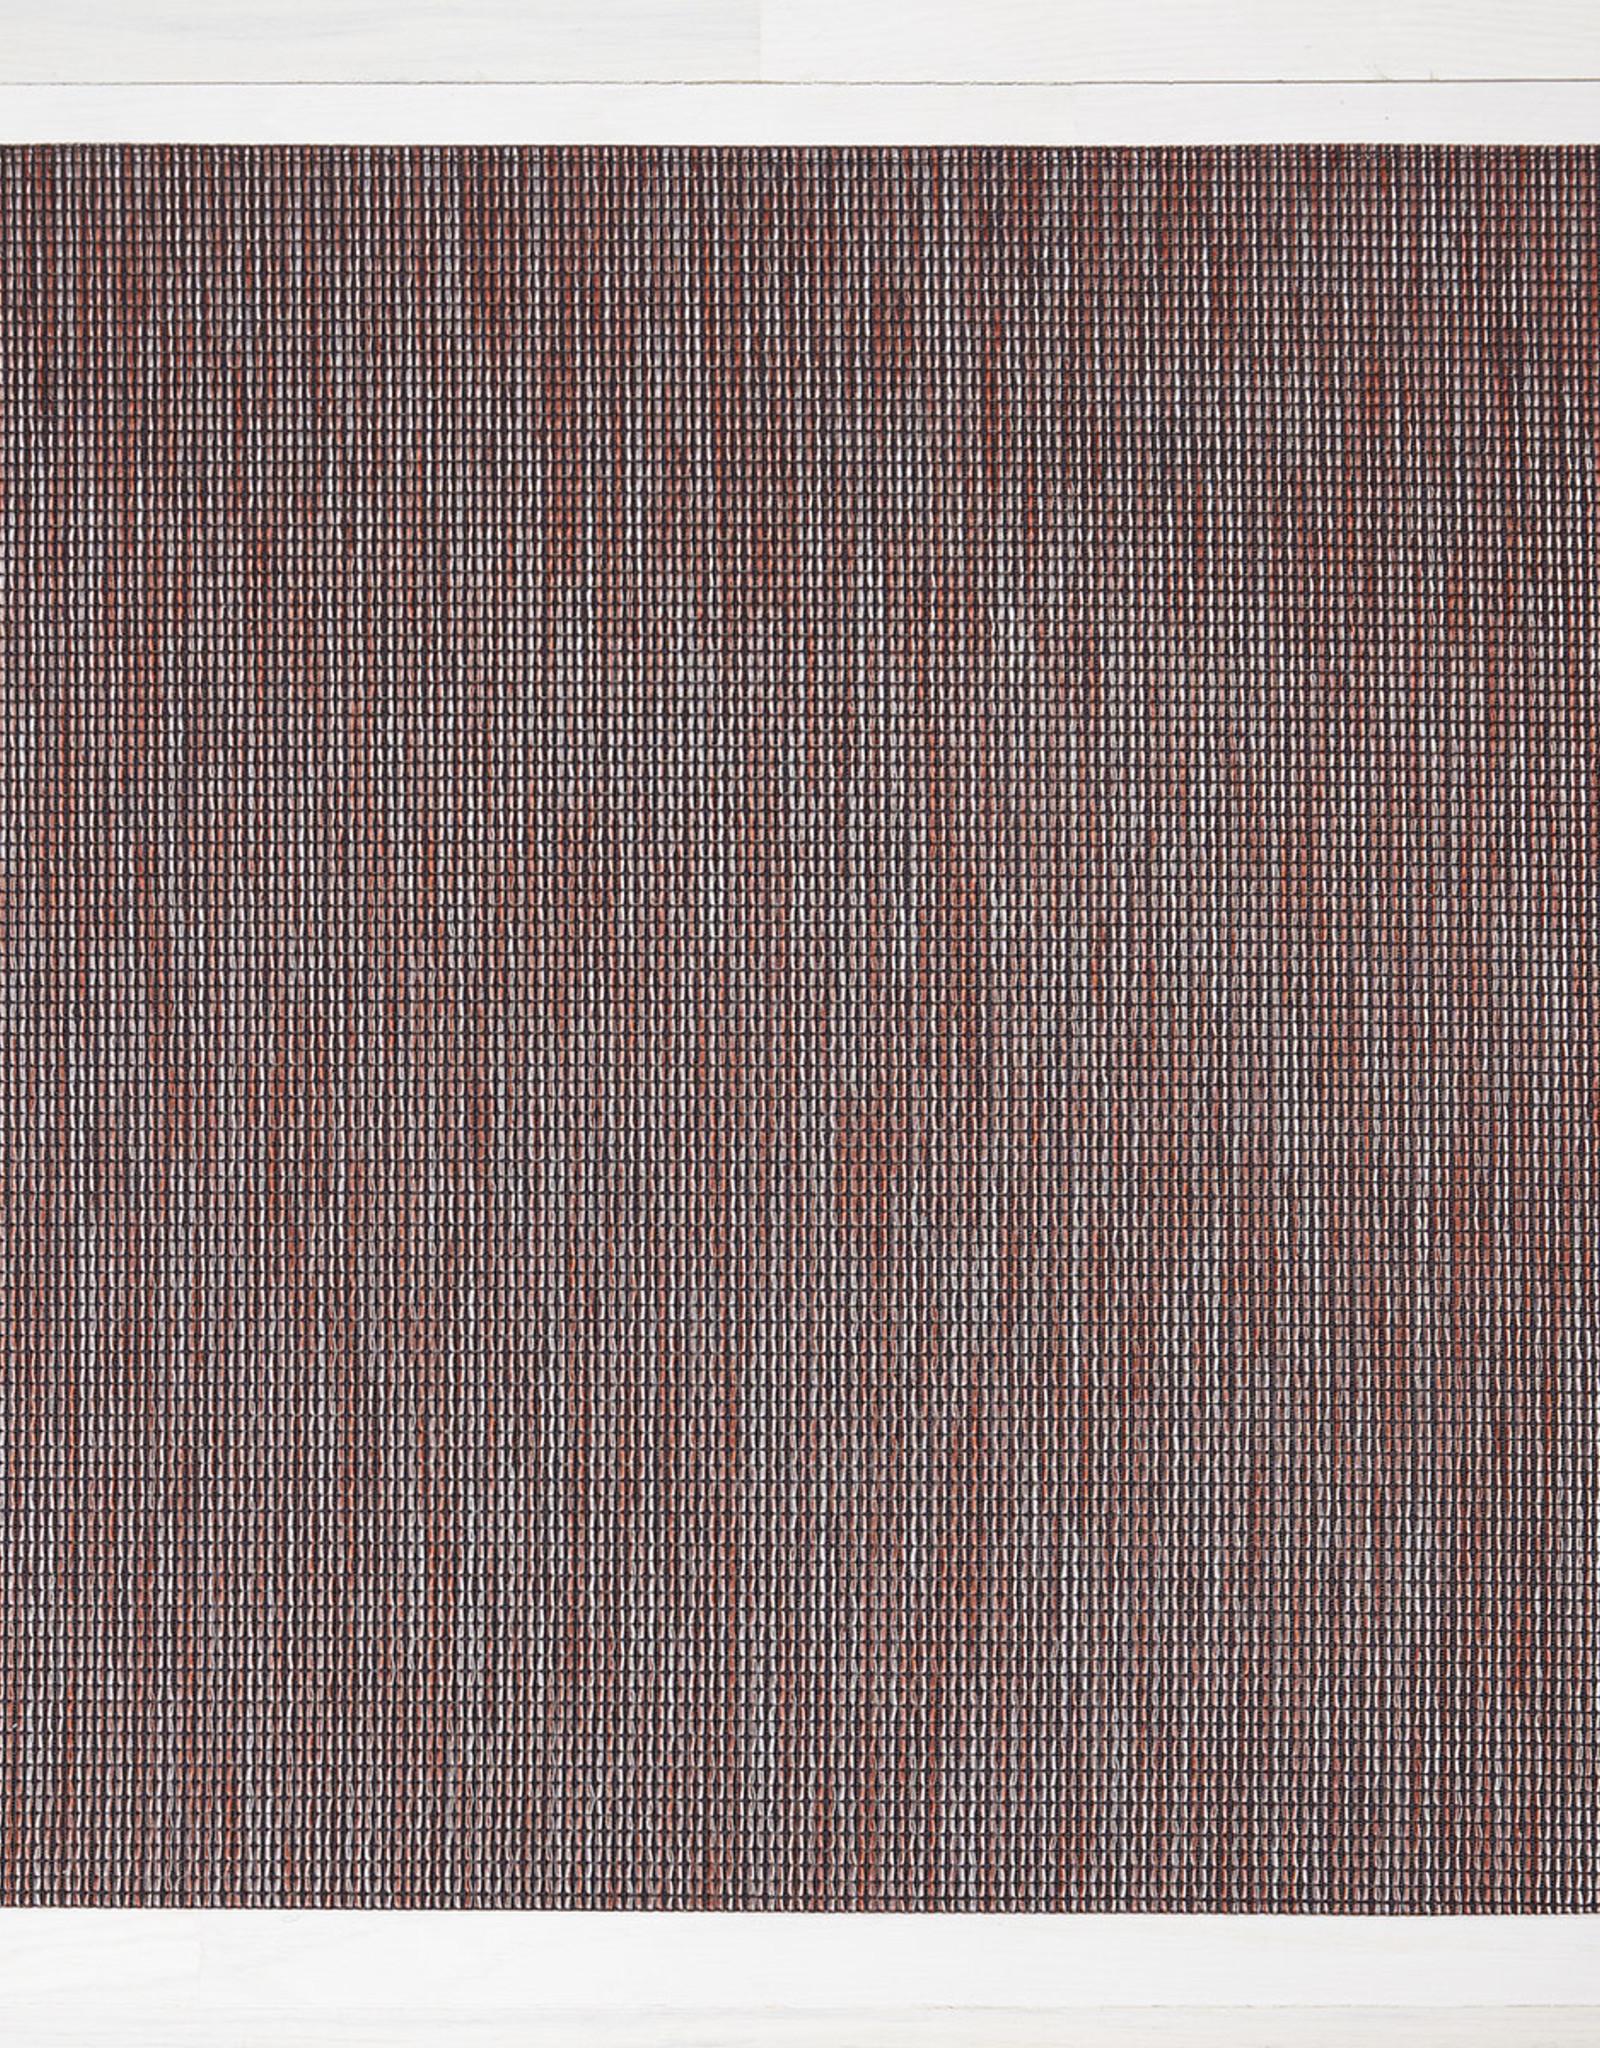 Chilewich Wabi Sabi Floormat 26 x 72, SIENNA